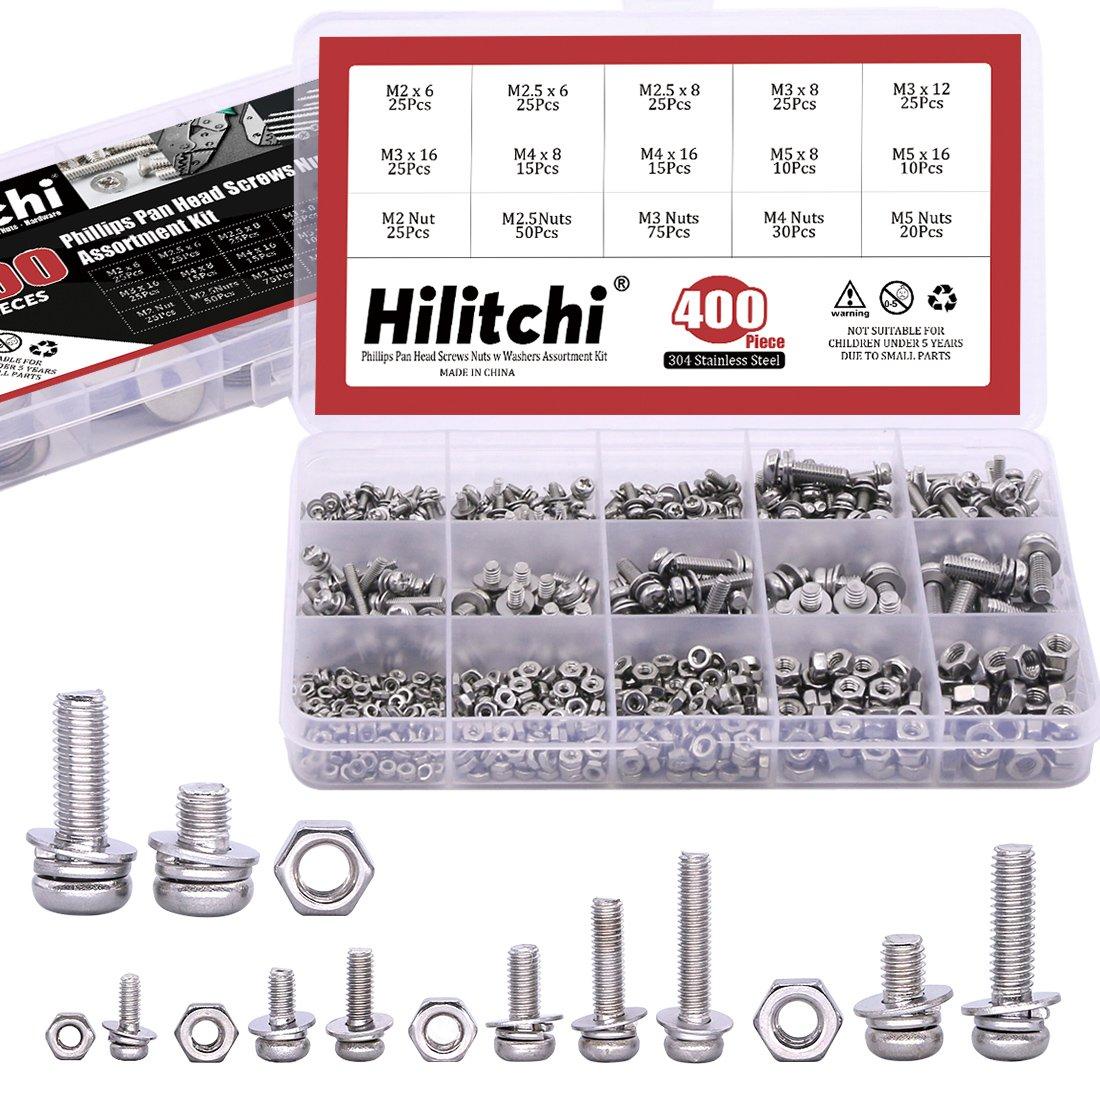 Hilitchi 400pcs M2 M2.5 M3 M4 M5 Phillips Pan Head Screws Nuts w Washers Assortment Kit - 304 Stainless Steel